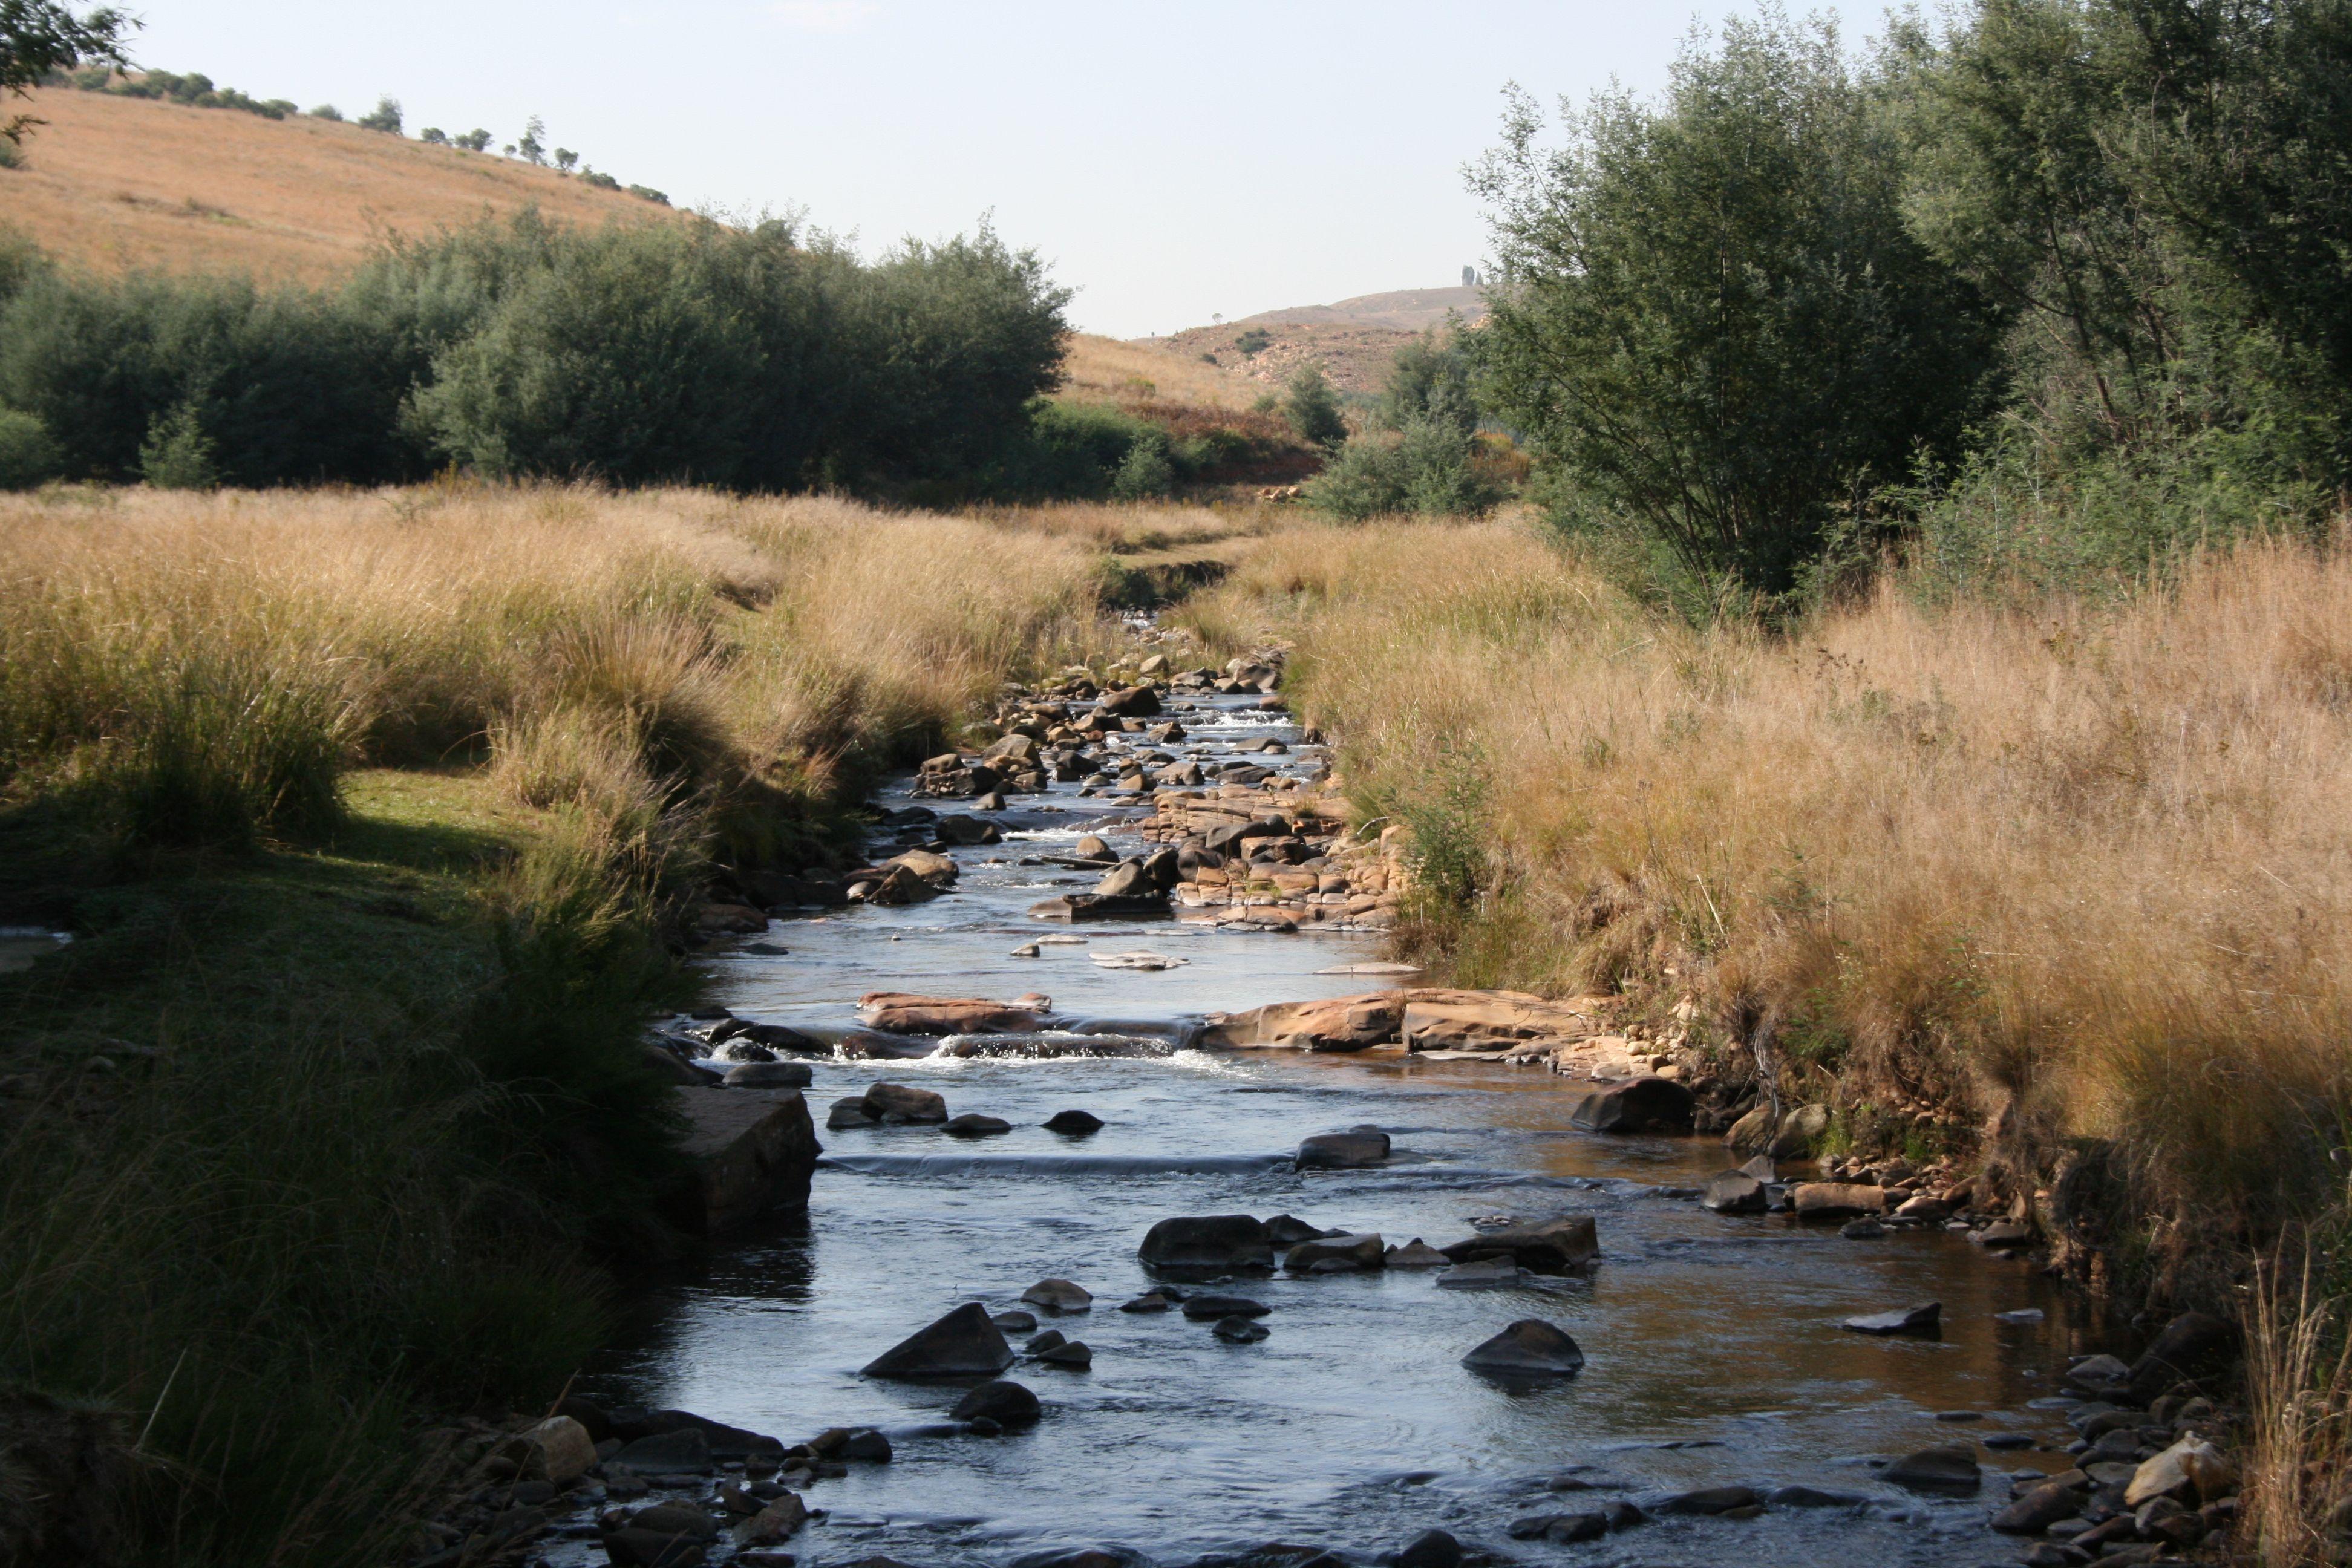 The Witpoort River near Dullstroom